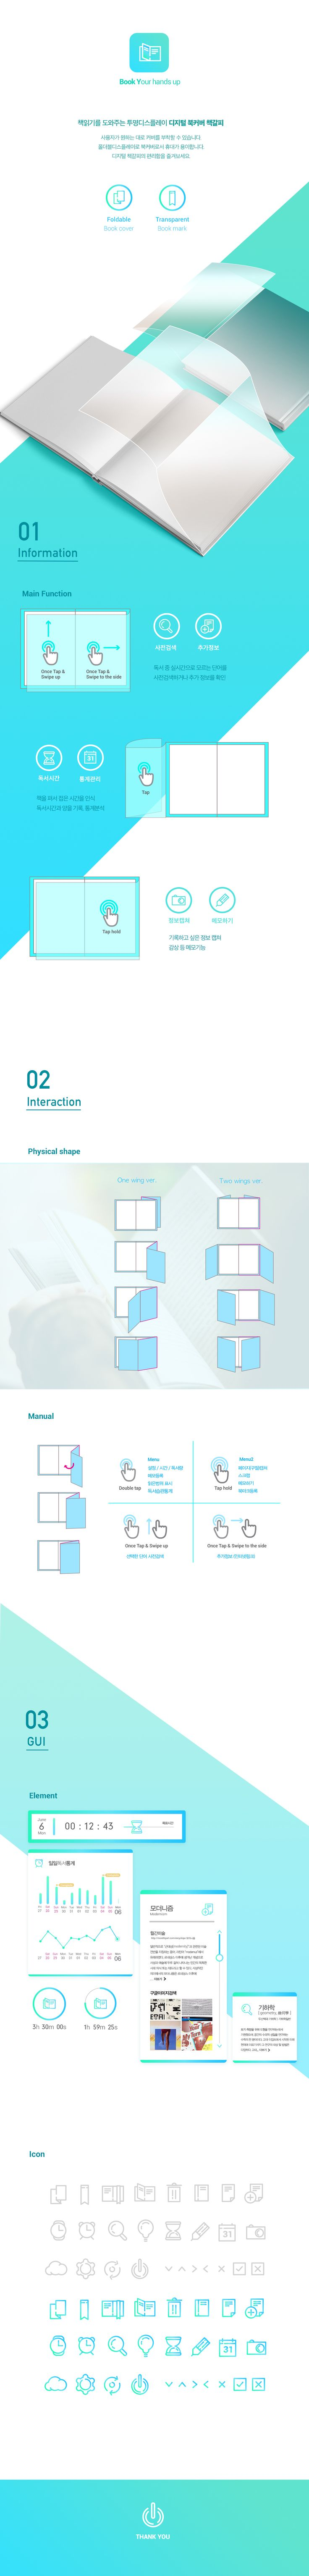 Visual interface design _ Project2 workstransparent display